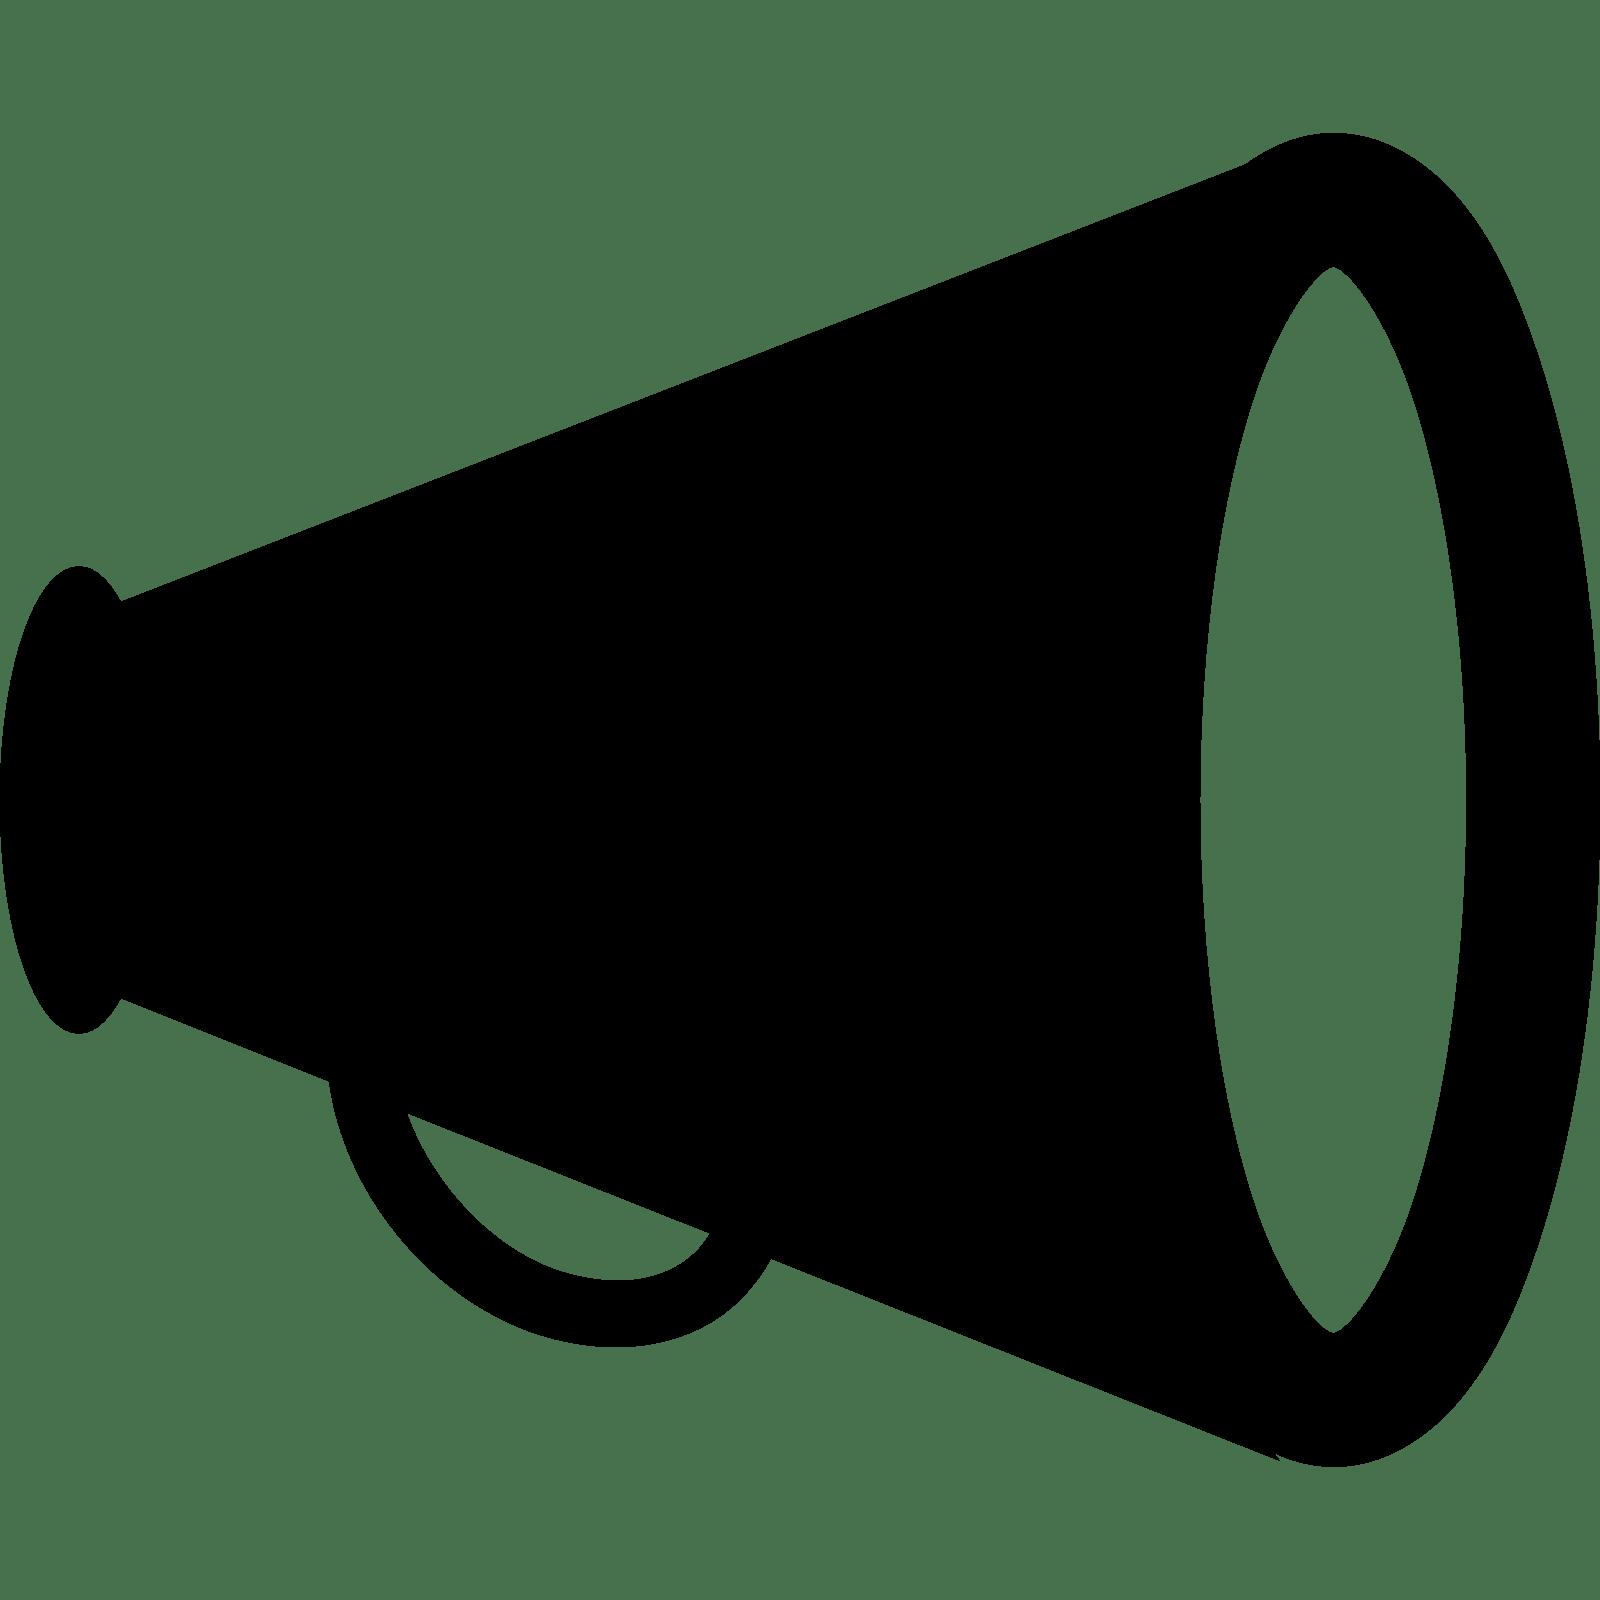 free png megaphone announcement transparent megaphone announcement rh pluspng com cheer megaphone vector free cheerleader megaphone vector free